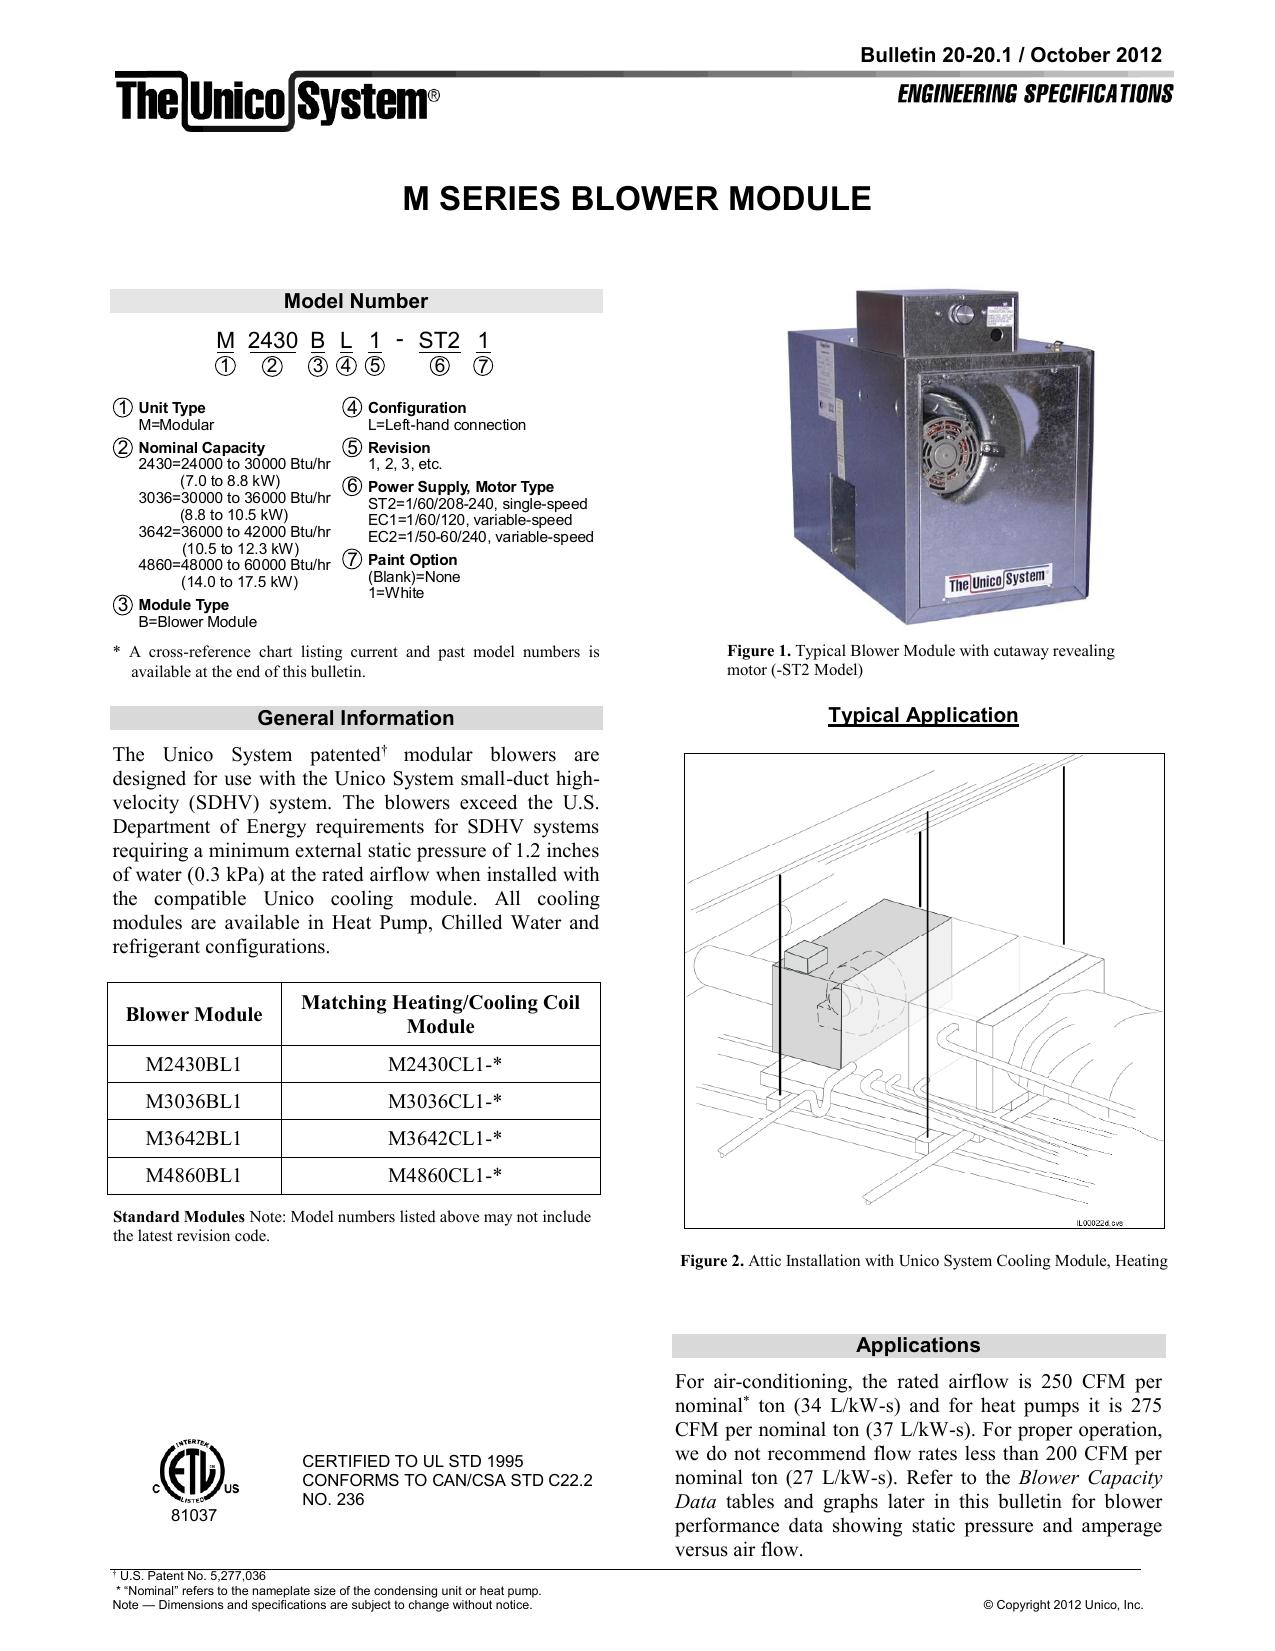 Blower Module - The Unico System   manualzz.com on